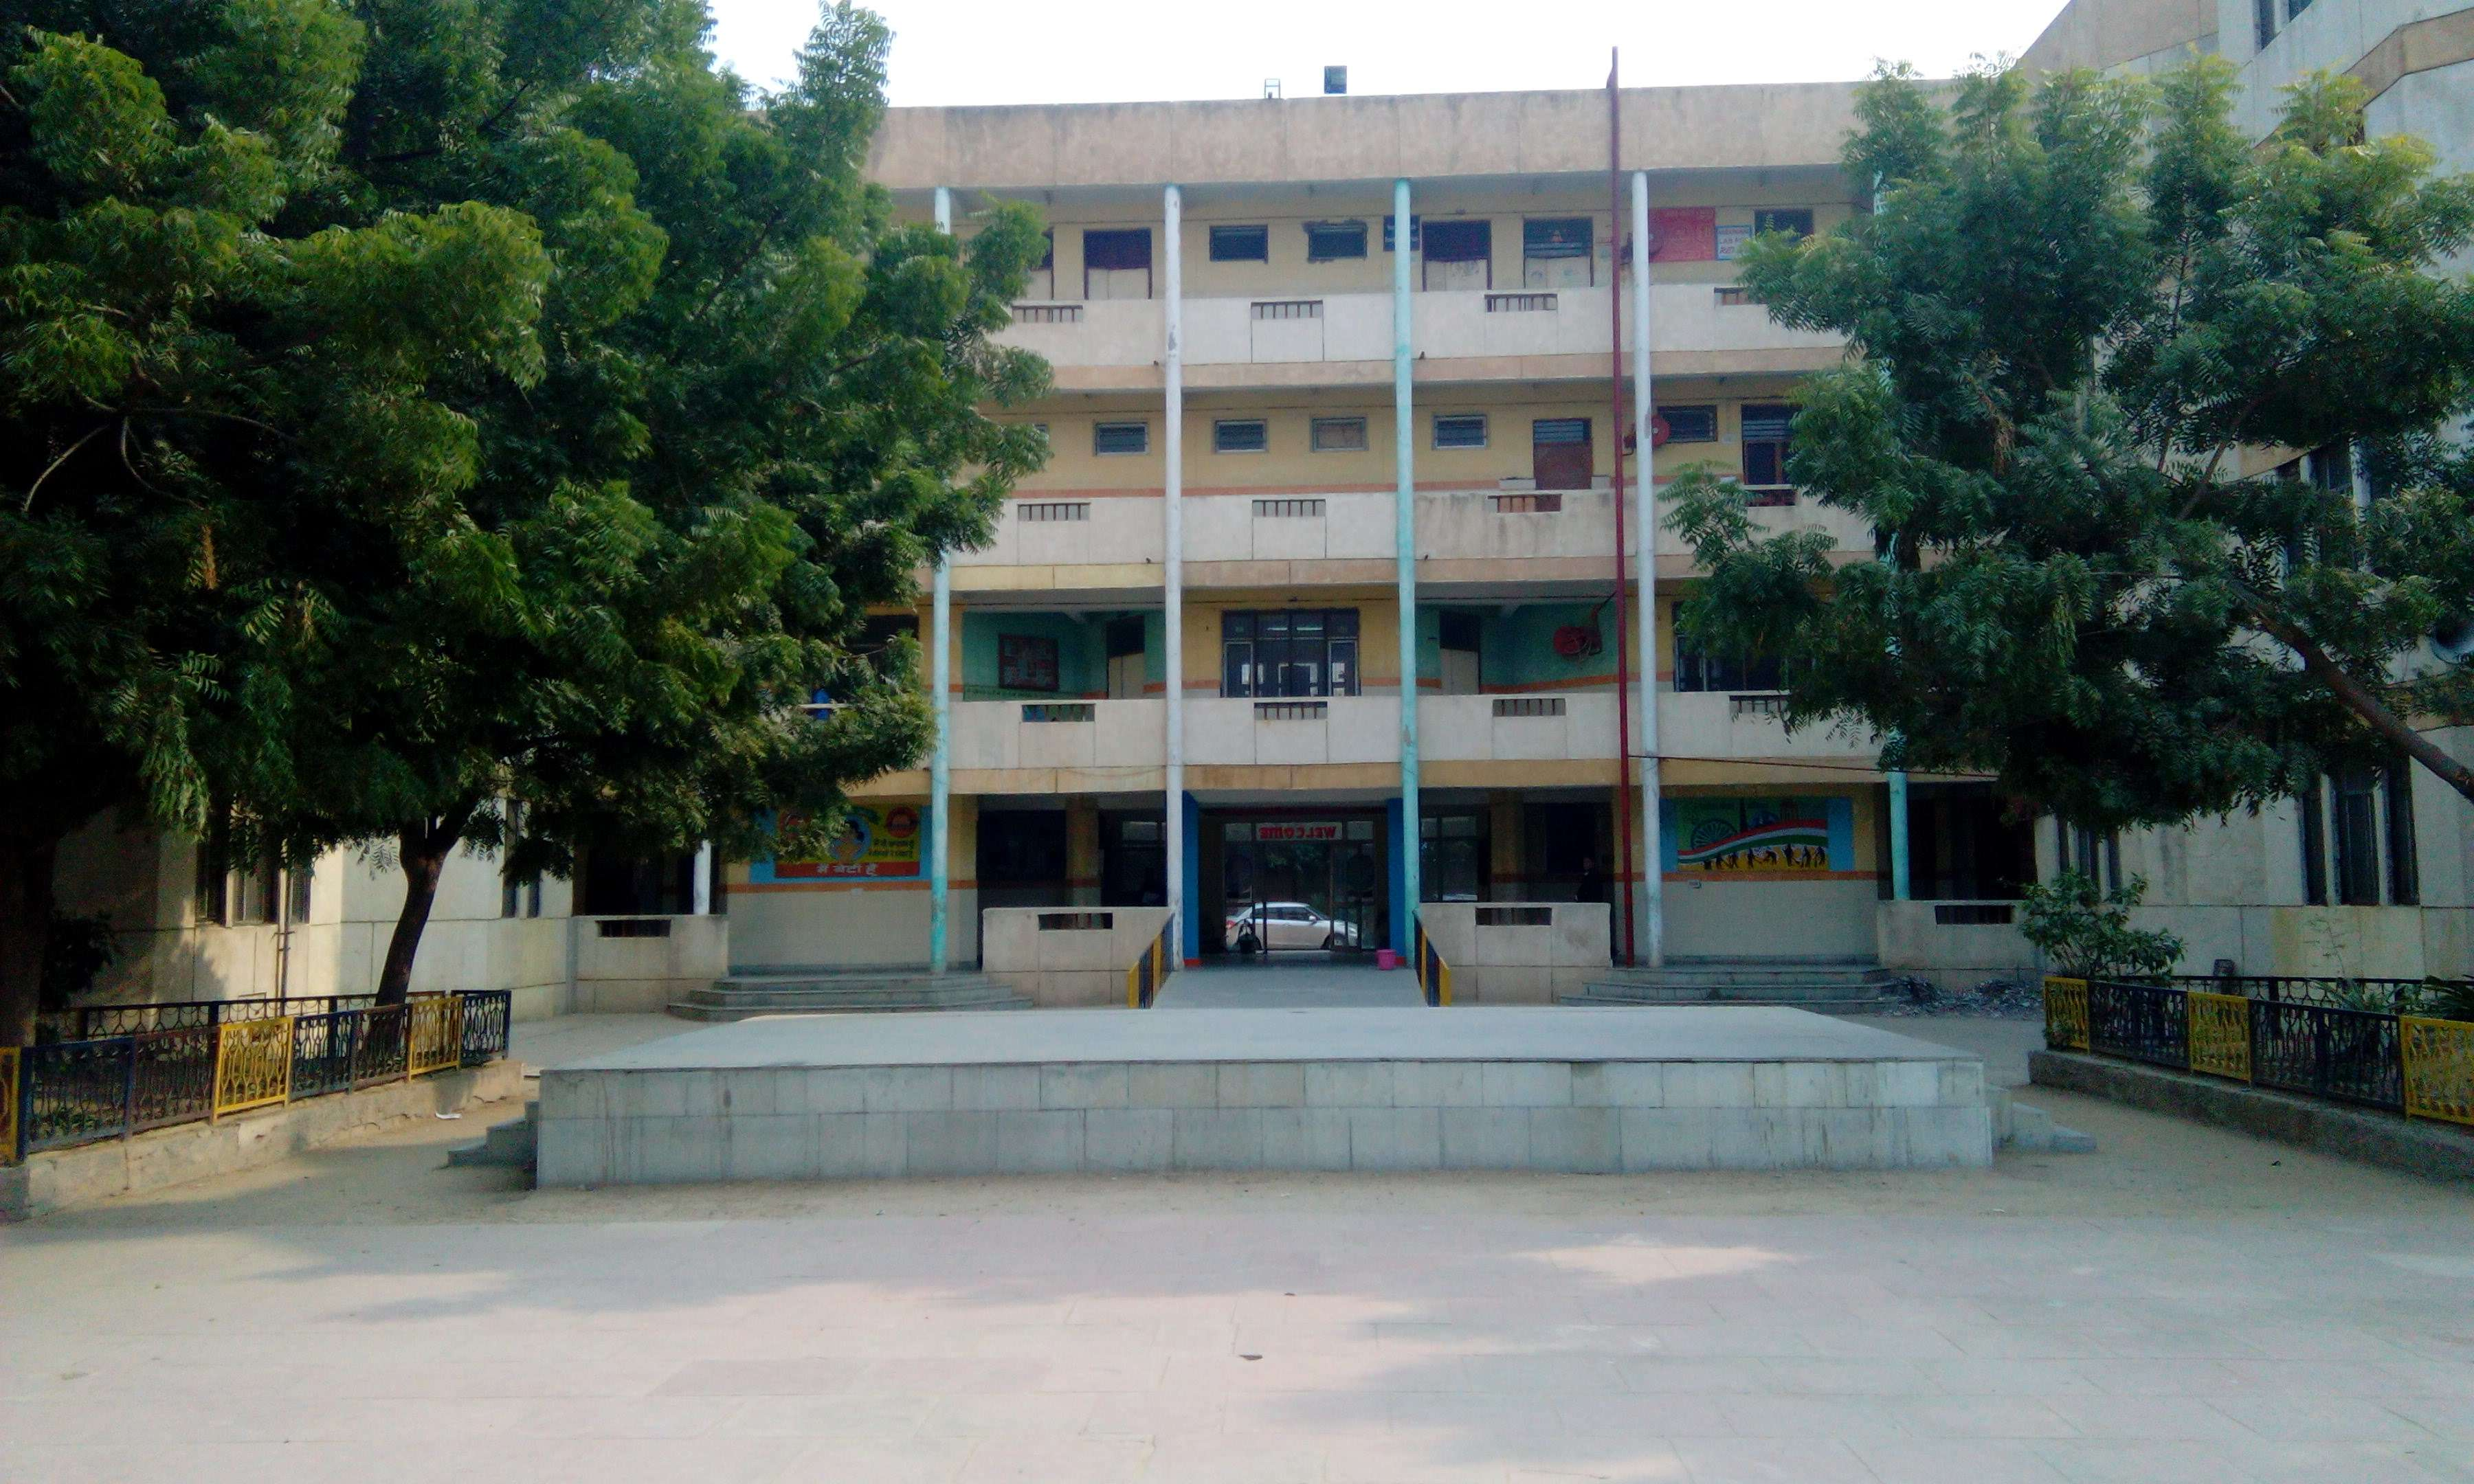 GOVT  BOYS SR  SEC  SCHOOL SECTOR - 3, (1ST SITE), DWARKA - The